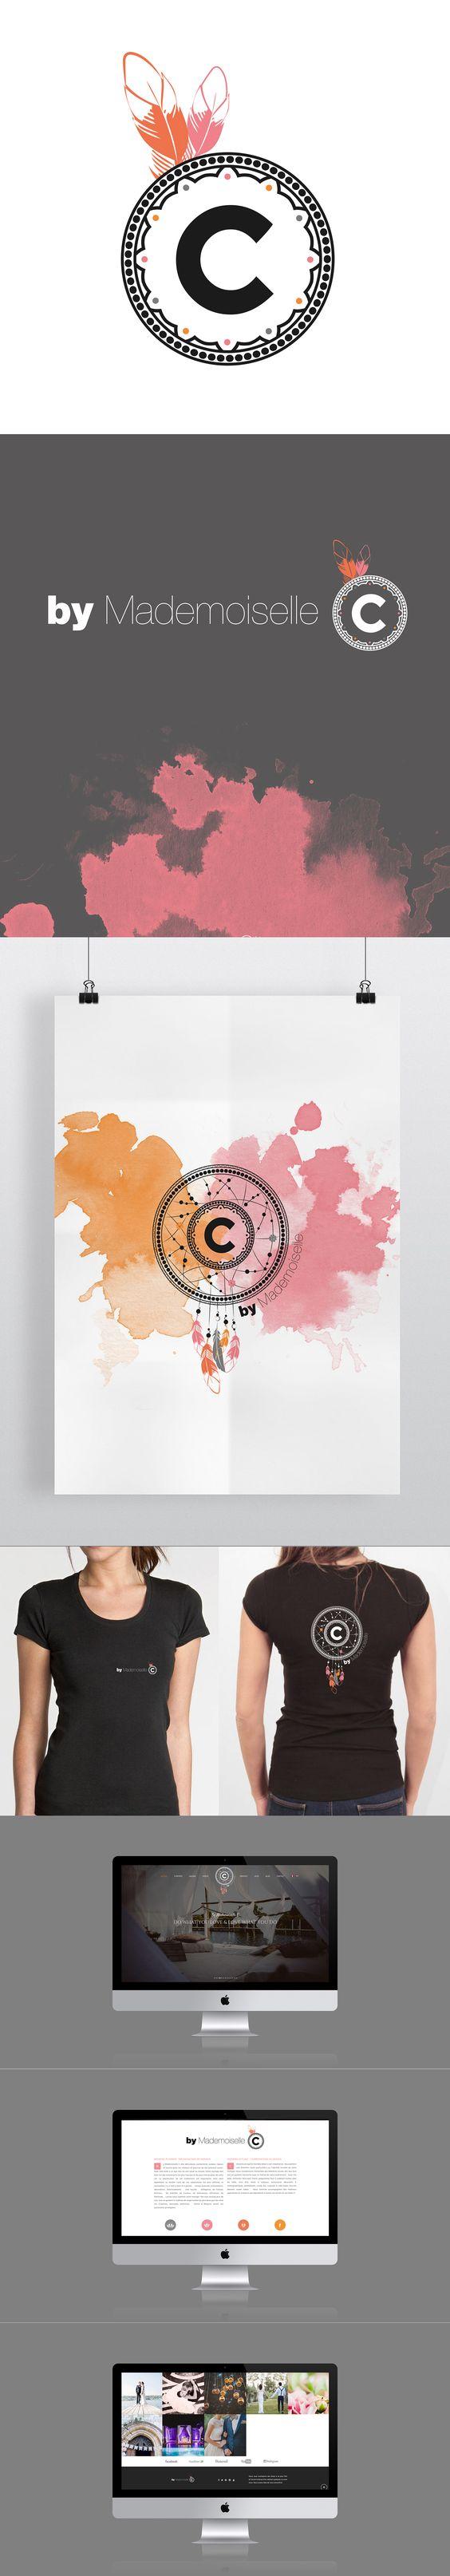 Logotype I Identité visuelle I Visual identity I Design by Crème de Papier I For By Mademoiselle C